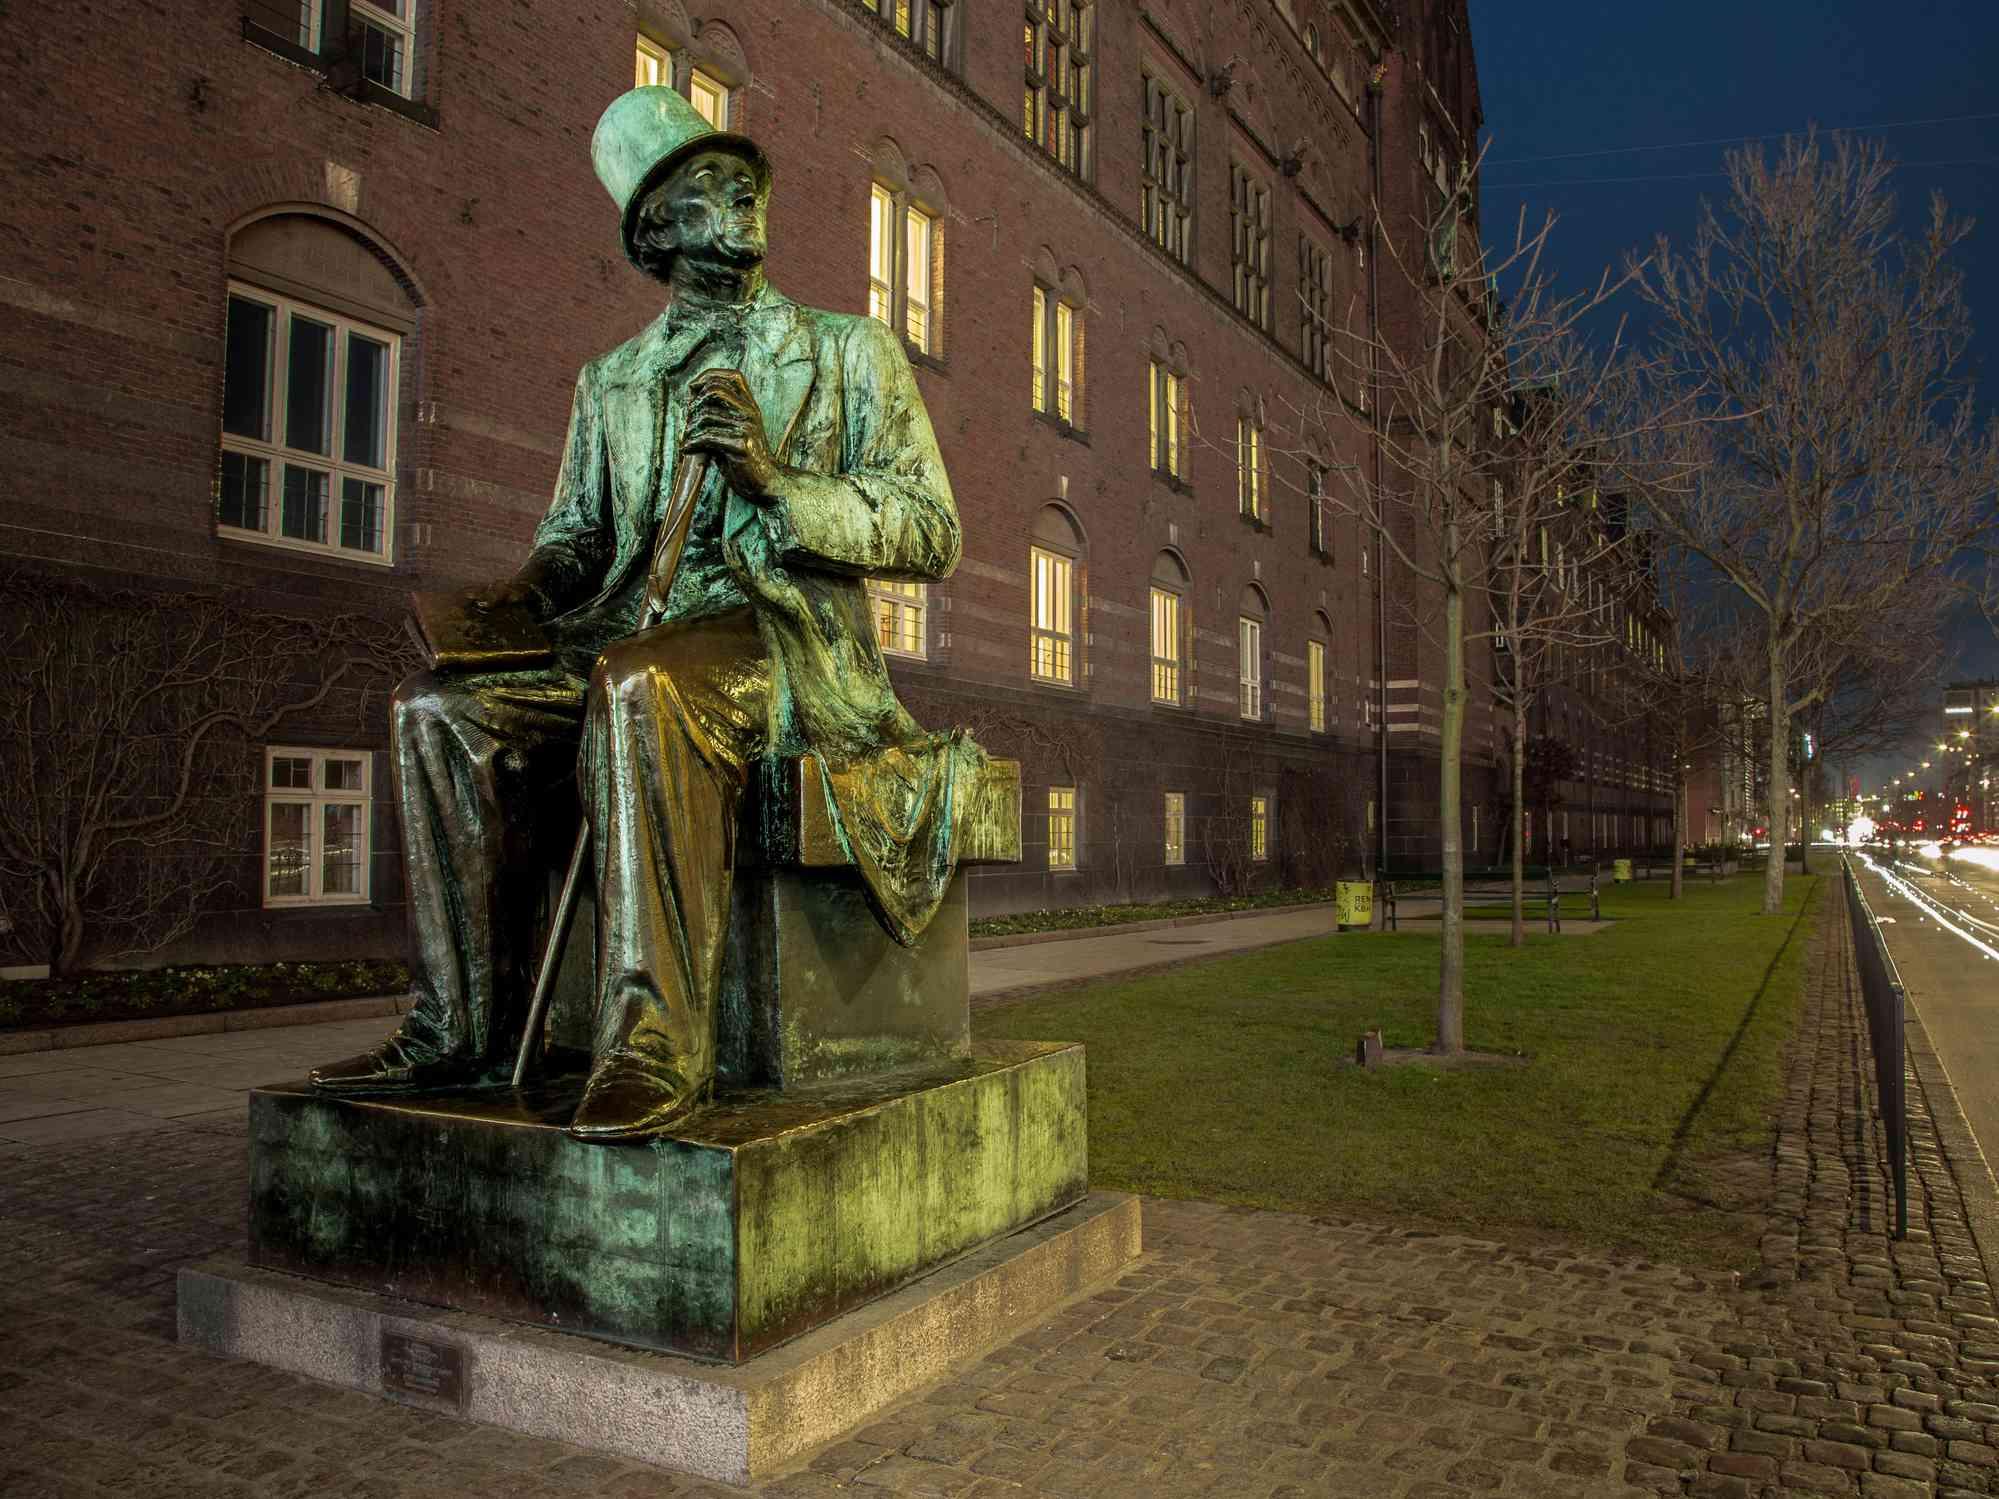 Hans Christian Andersen statue next to the Copenhagen Town Hall